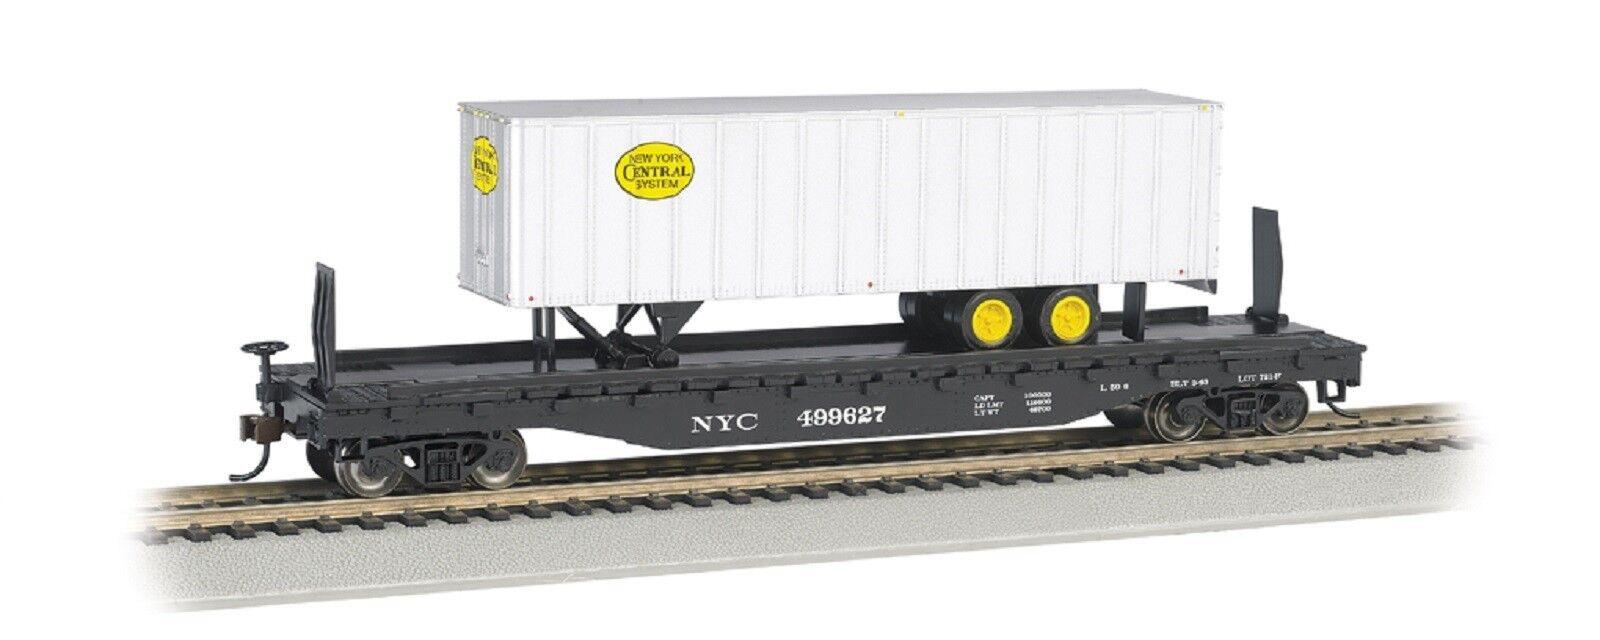 16703 WAGON Plat Transport remorque NYC Bachmann Train HO 1 87